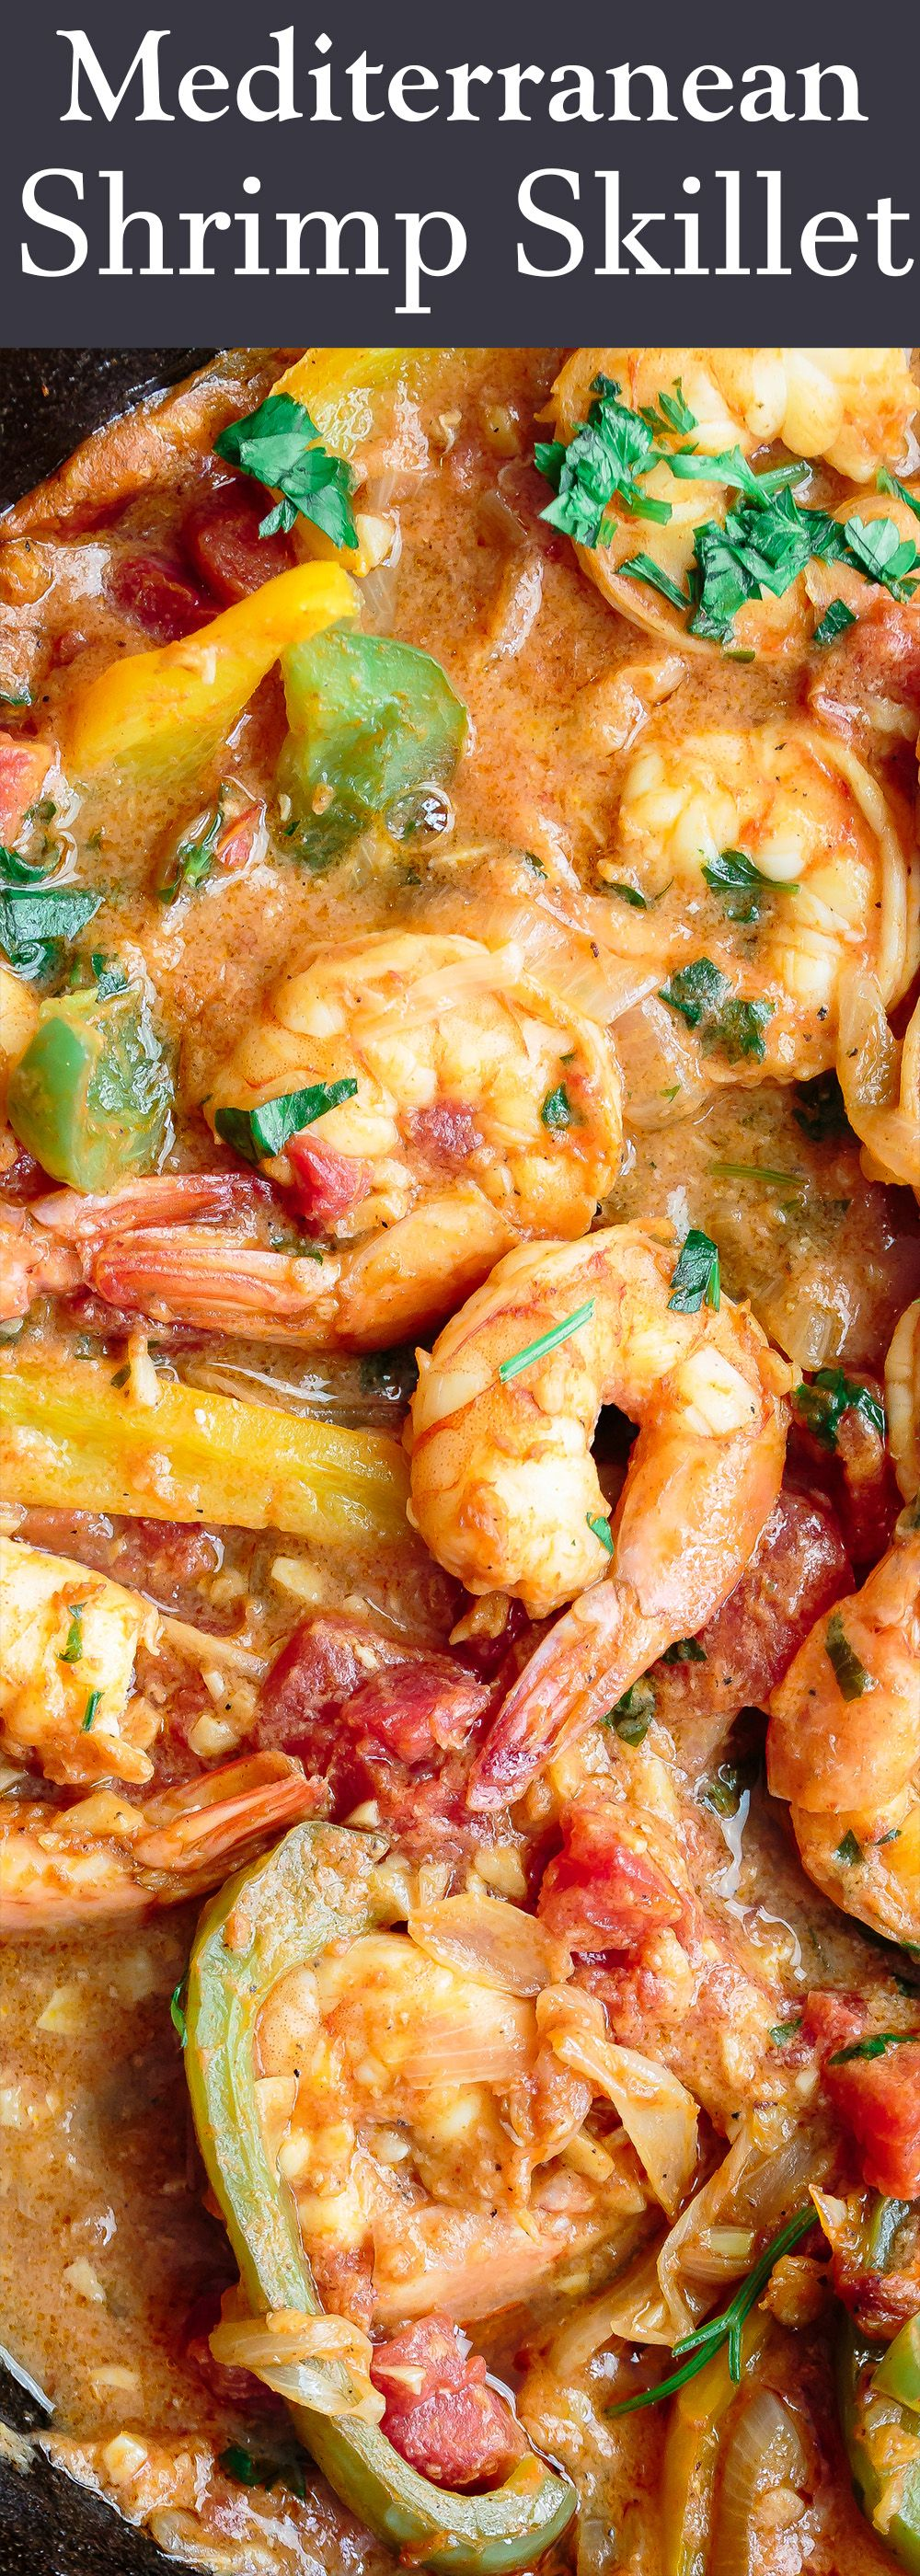 Mediterranean Diet A Meal Plan and Beginner s Guide